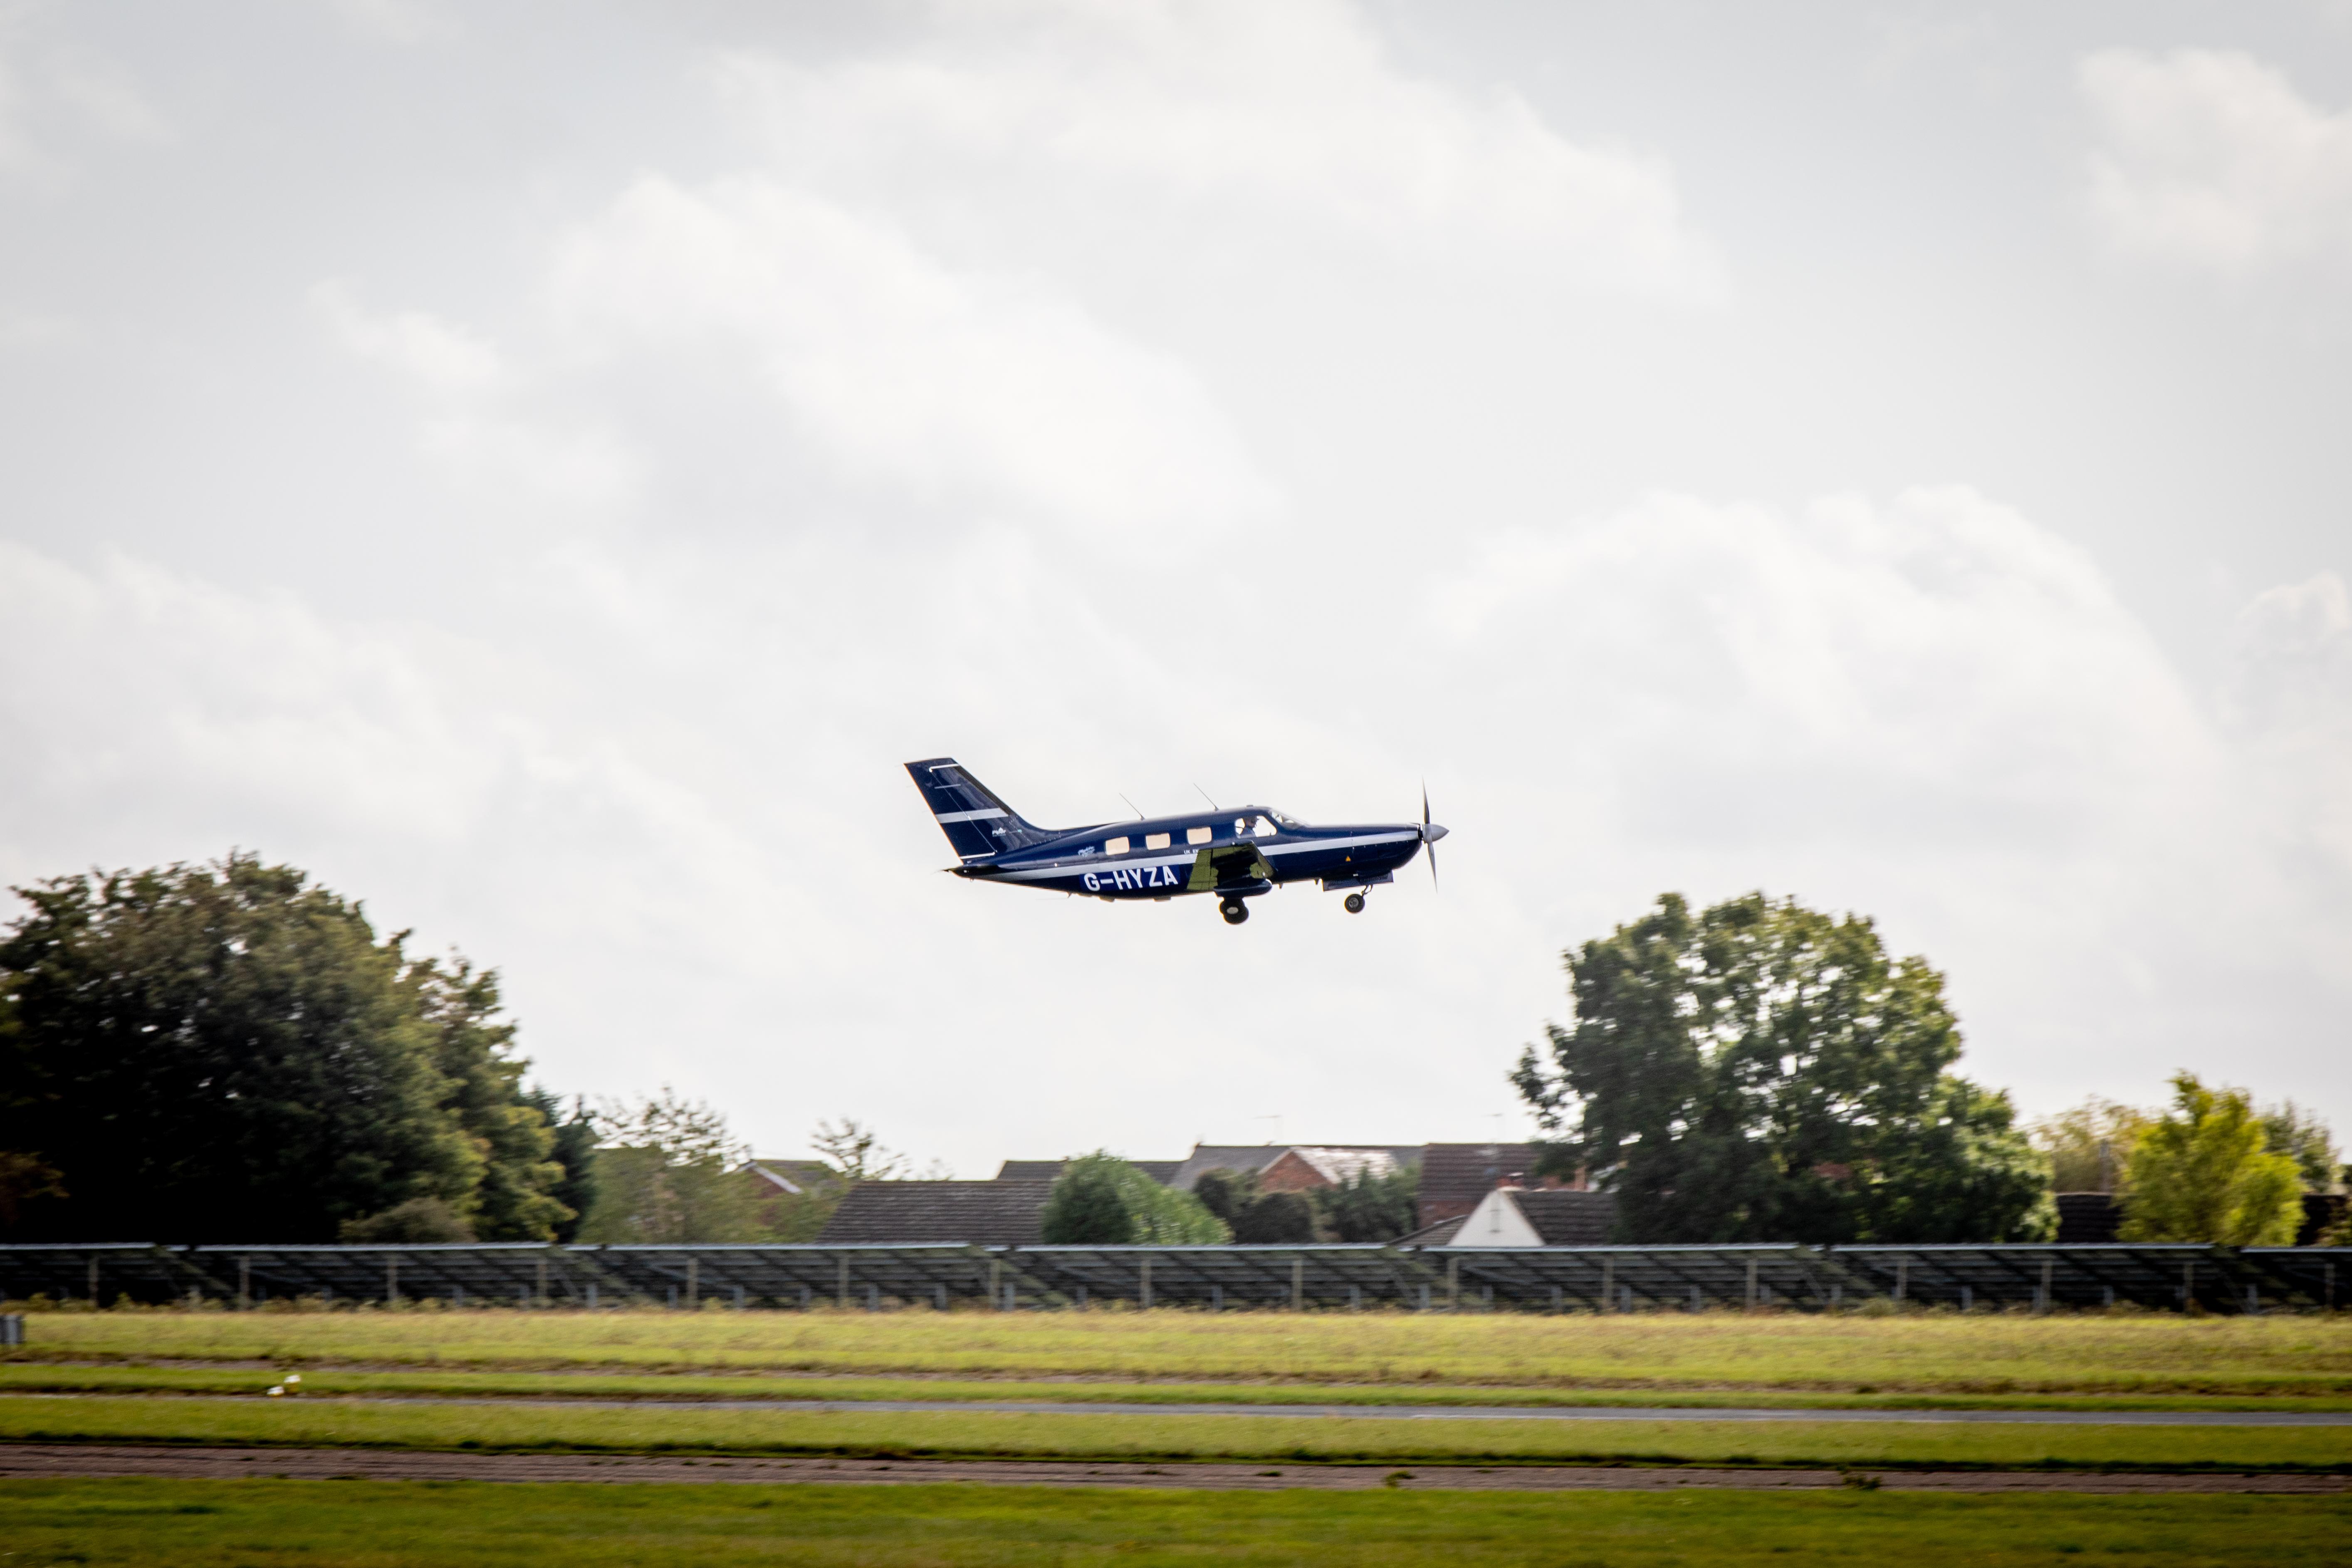 International Business: Support for ZeroAvia's hydrogen plane plan